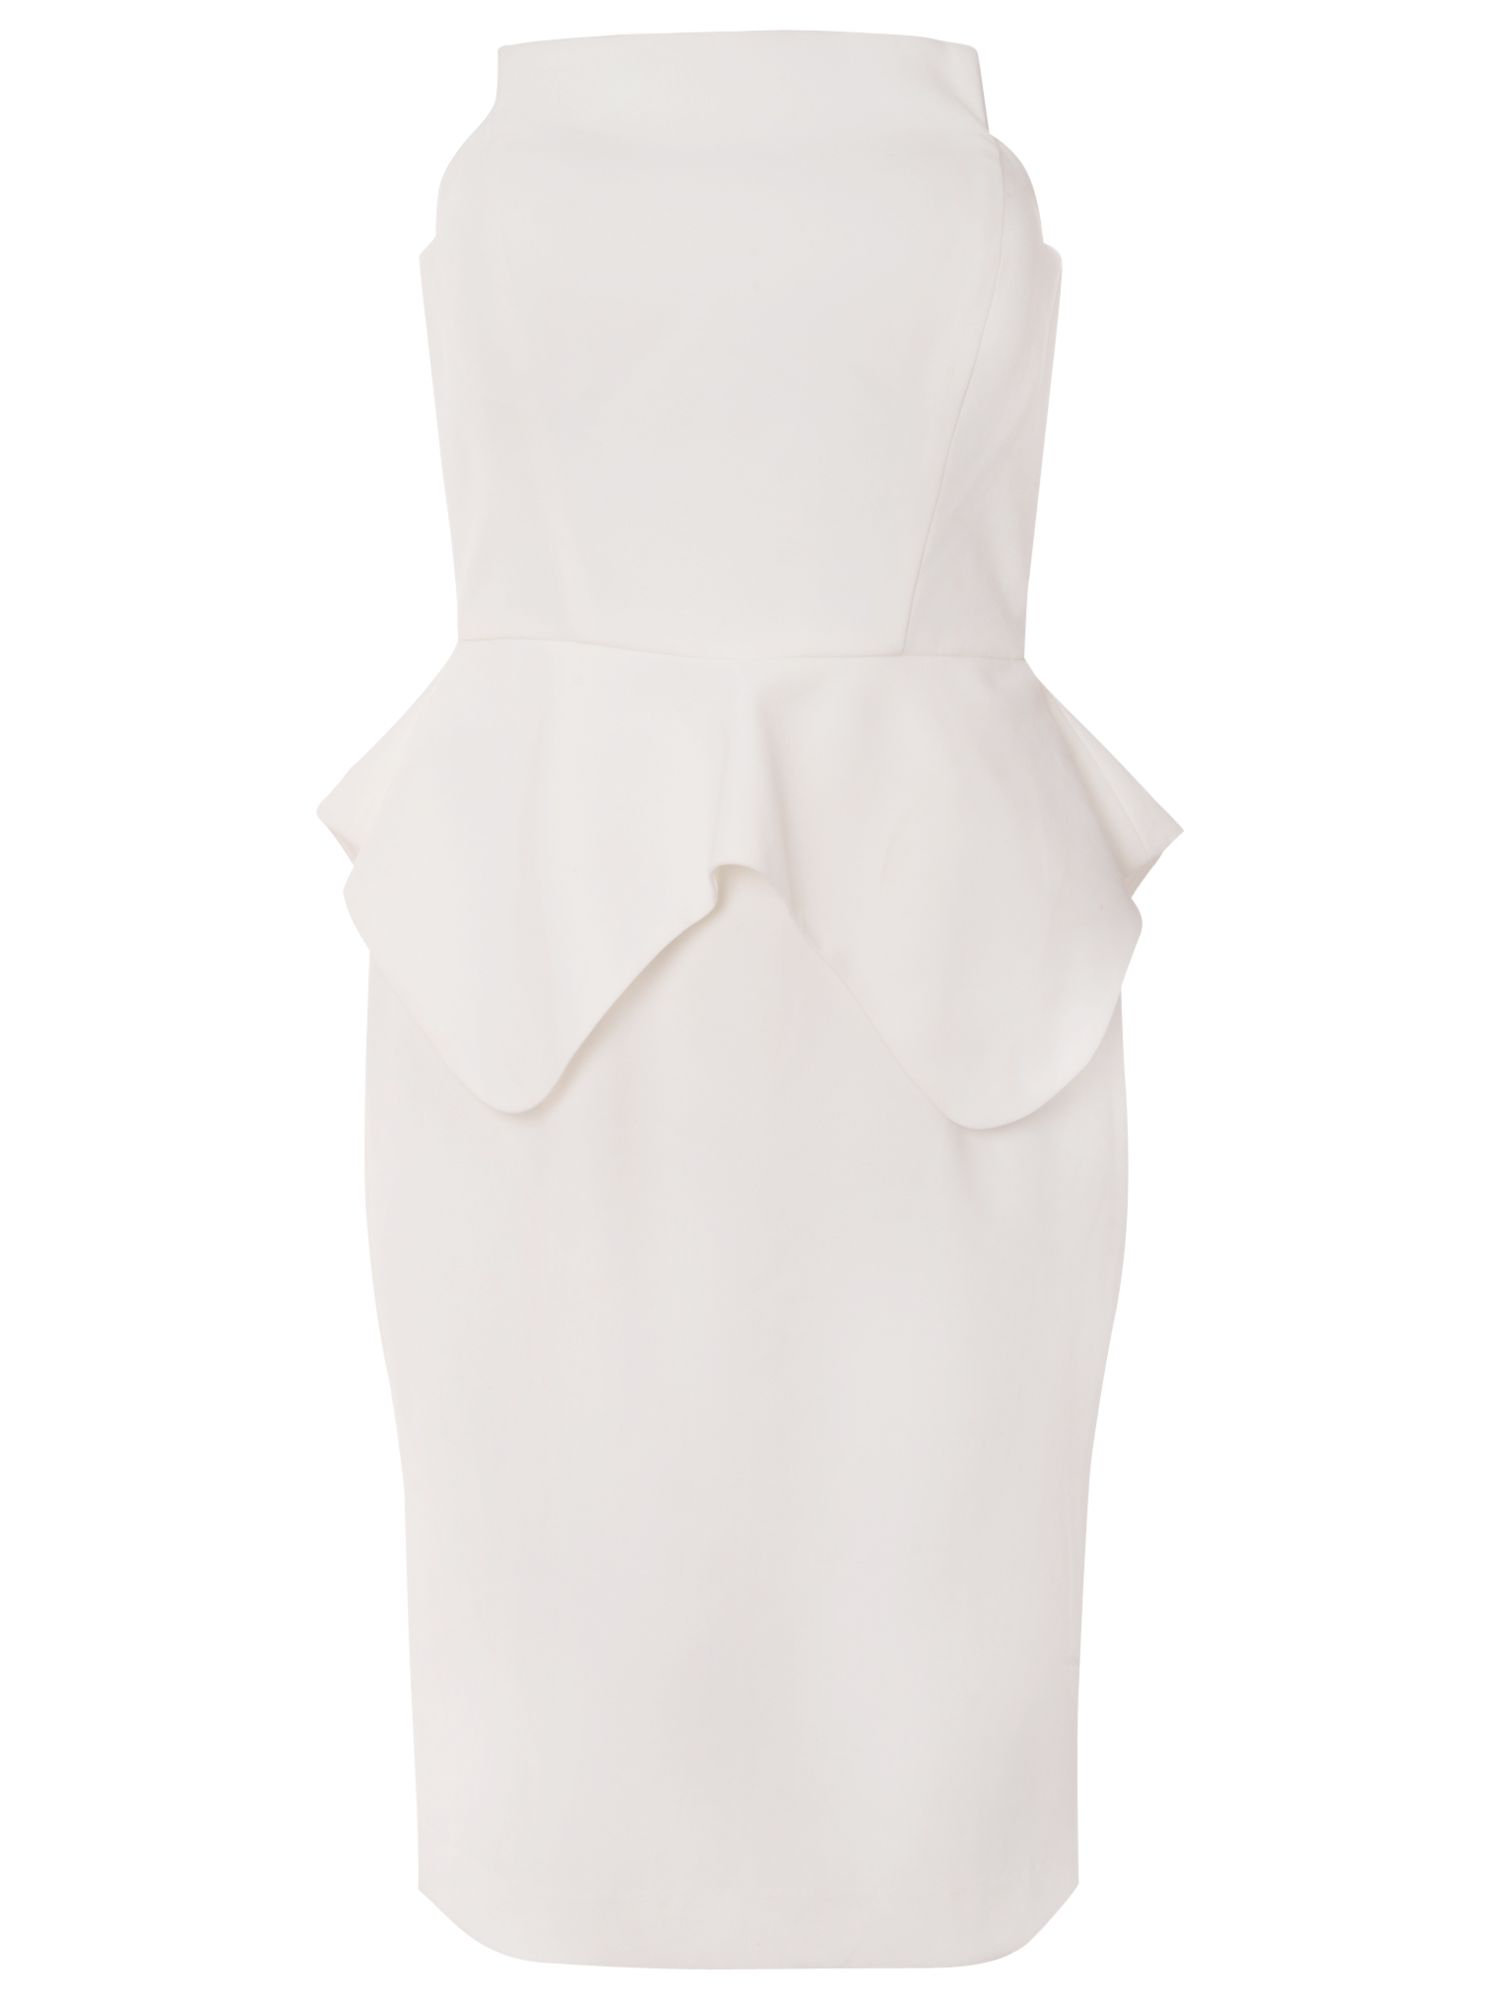 true decadence bandeau peplum dress white, true, decadence, bandeau, peplum, dress, white, true decadence, 18|16|14|12|8|10, women, womens dresses, 1679265